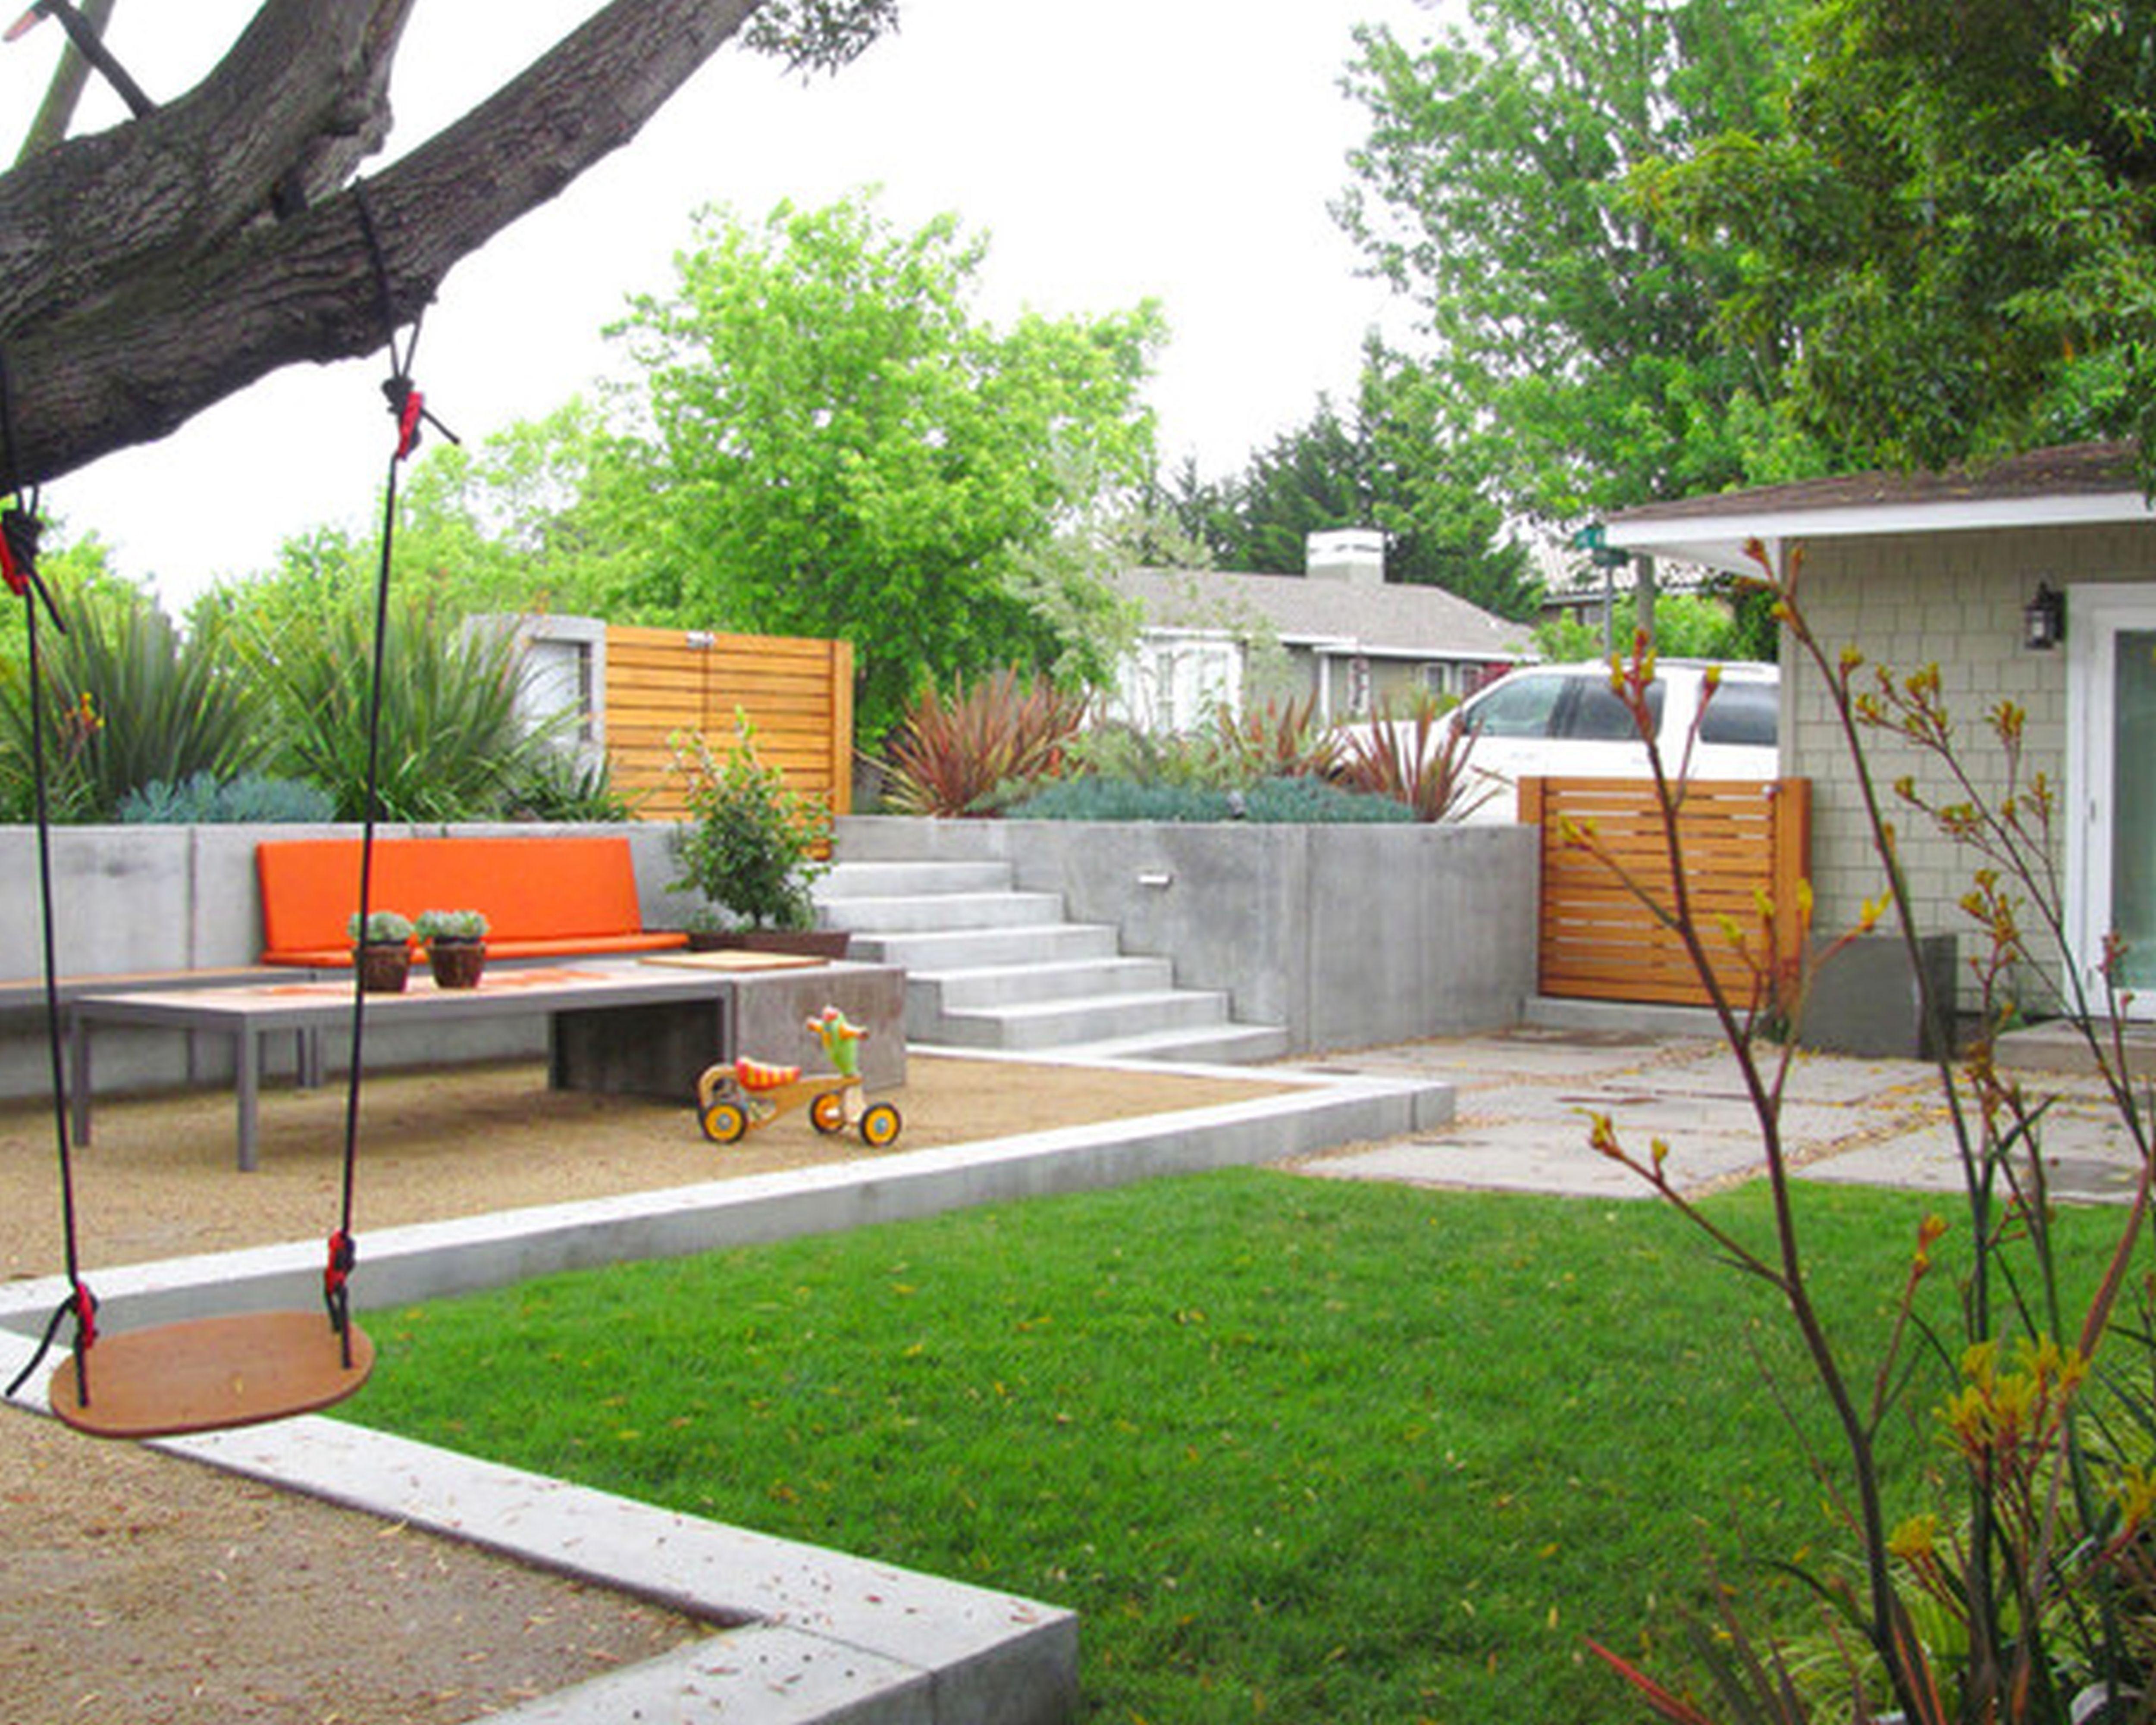 Landscape A Simple Minimalist Sloping Backyard Easy Basic